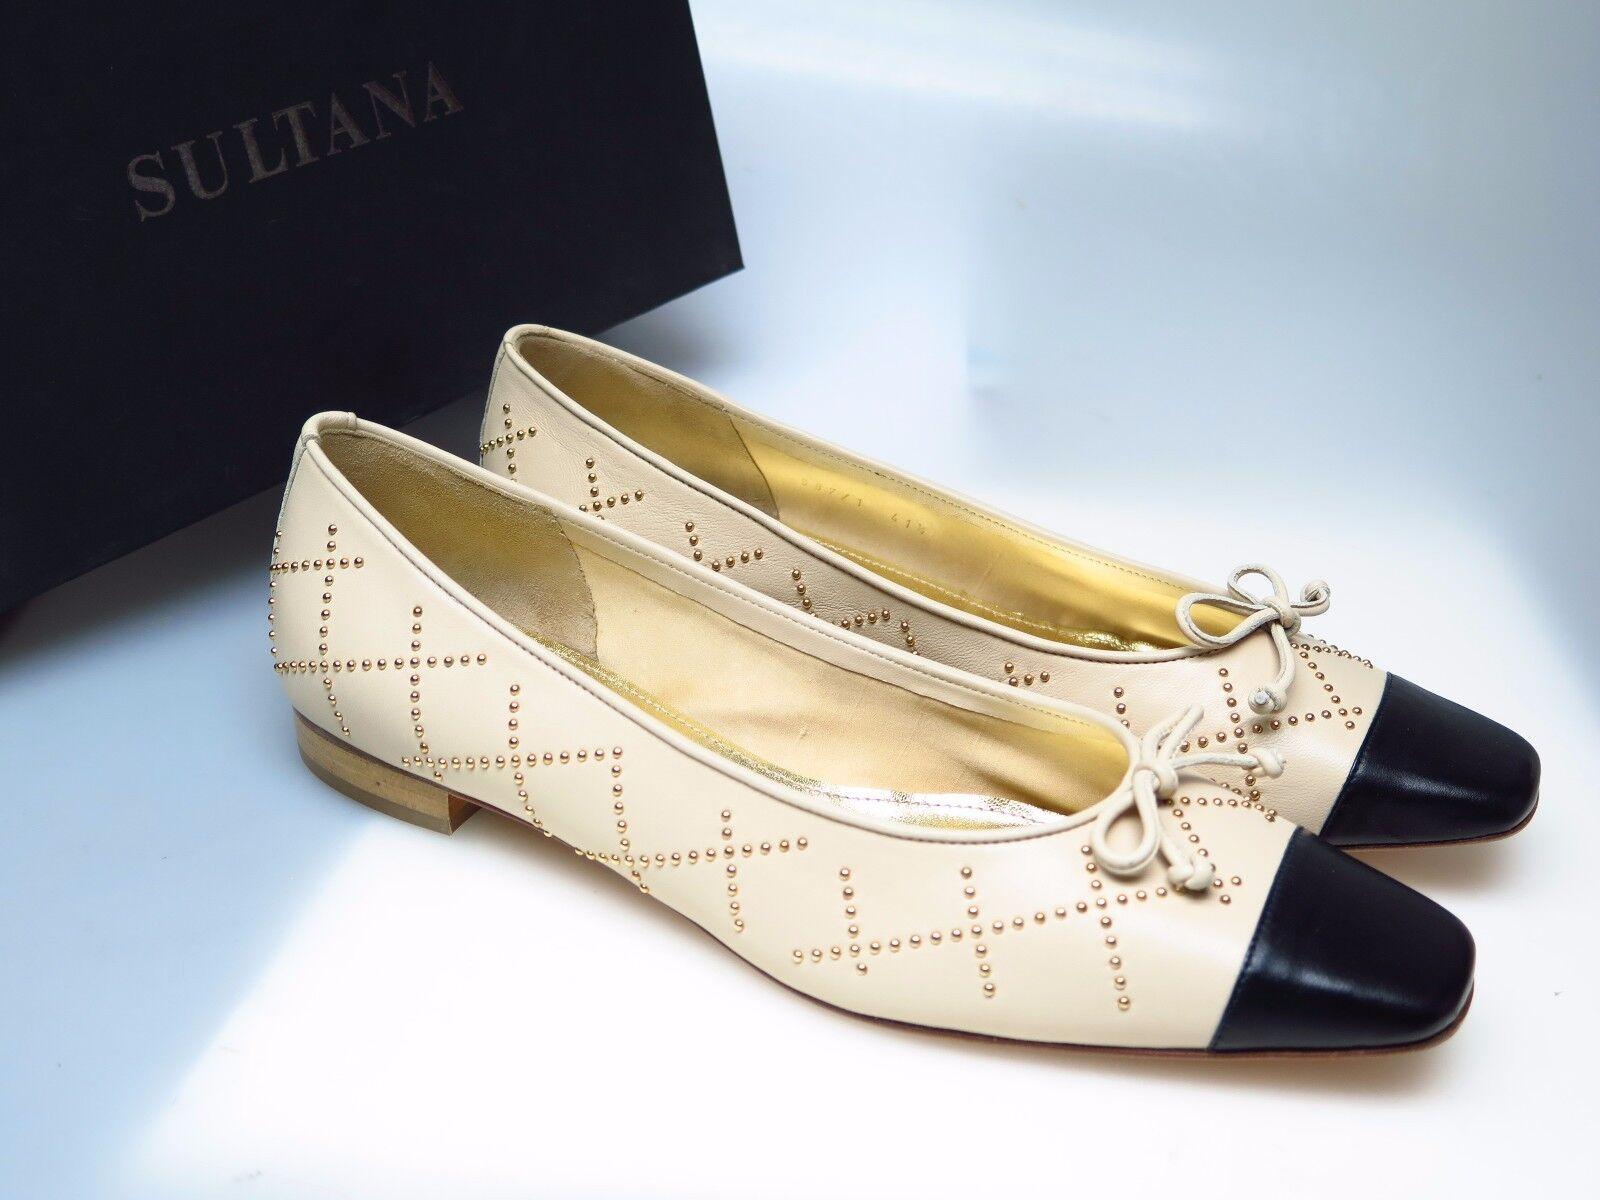 SULTANA SULTANA SULTANA Schuhe Designer Damenschuhe N4346 Tati Nappa Beige Simona Gr. 41,5 NEU d8b9db